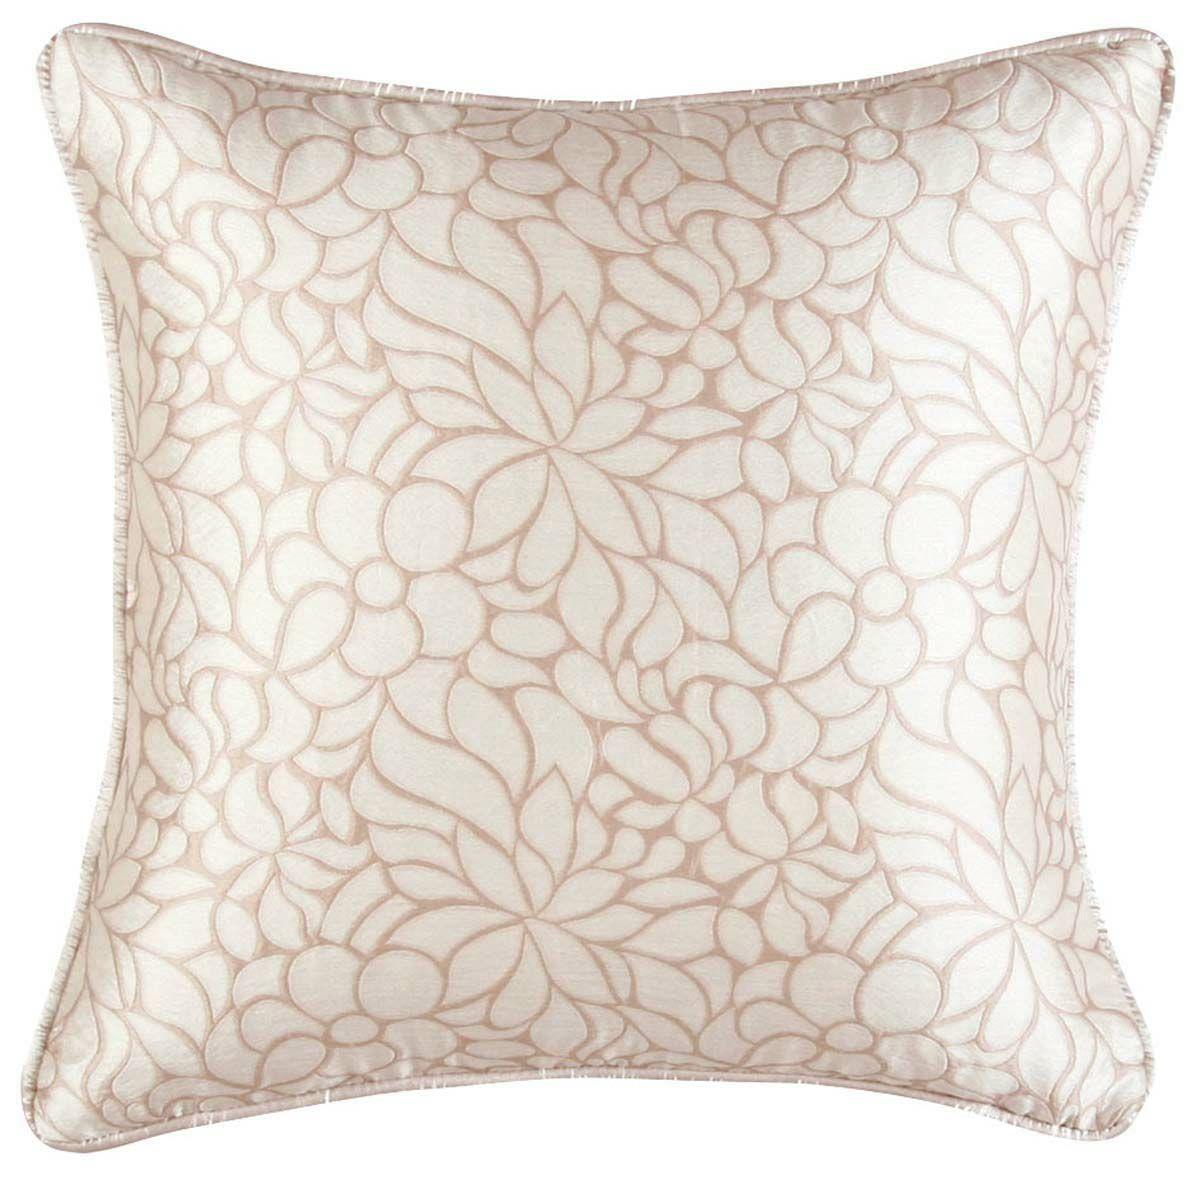 Lumina Decorative Pillows Luxe Bedroom